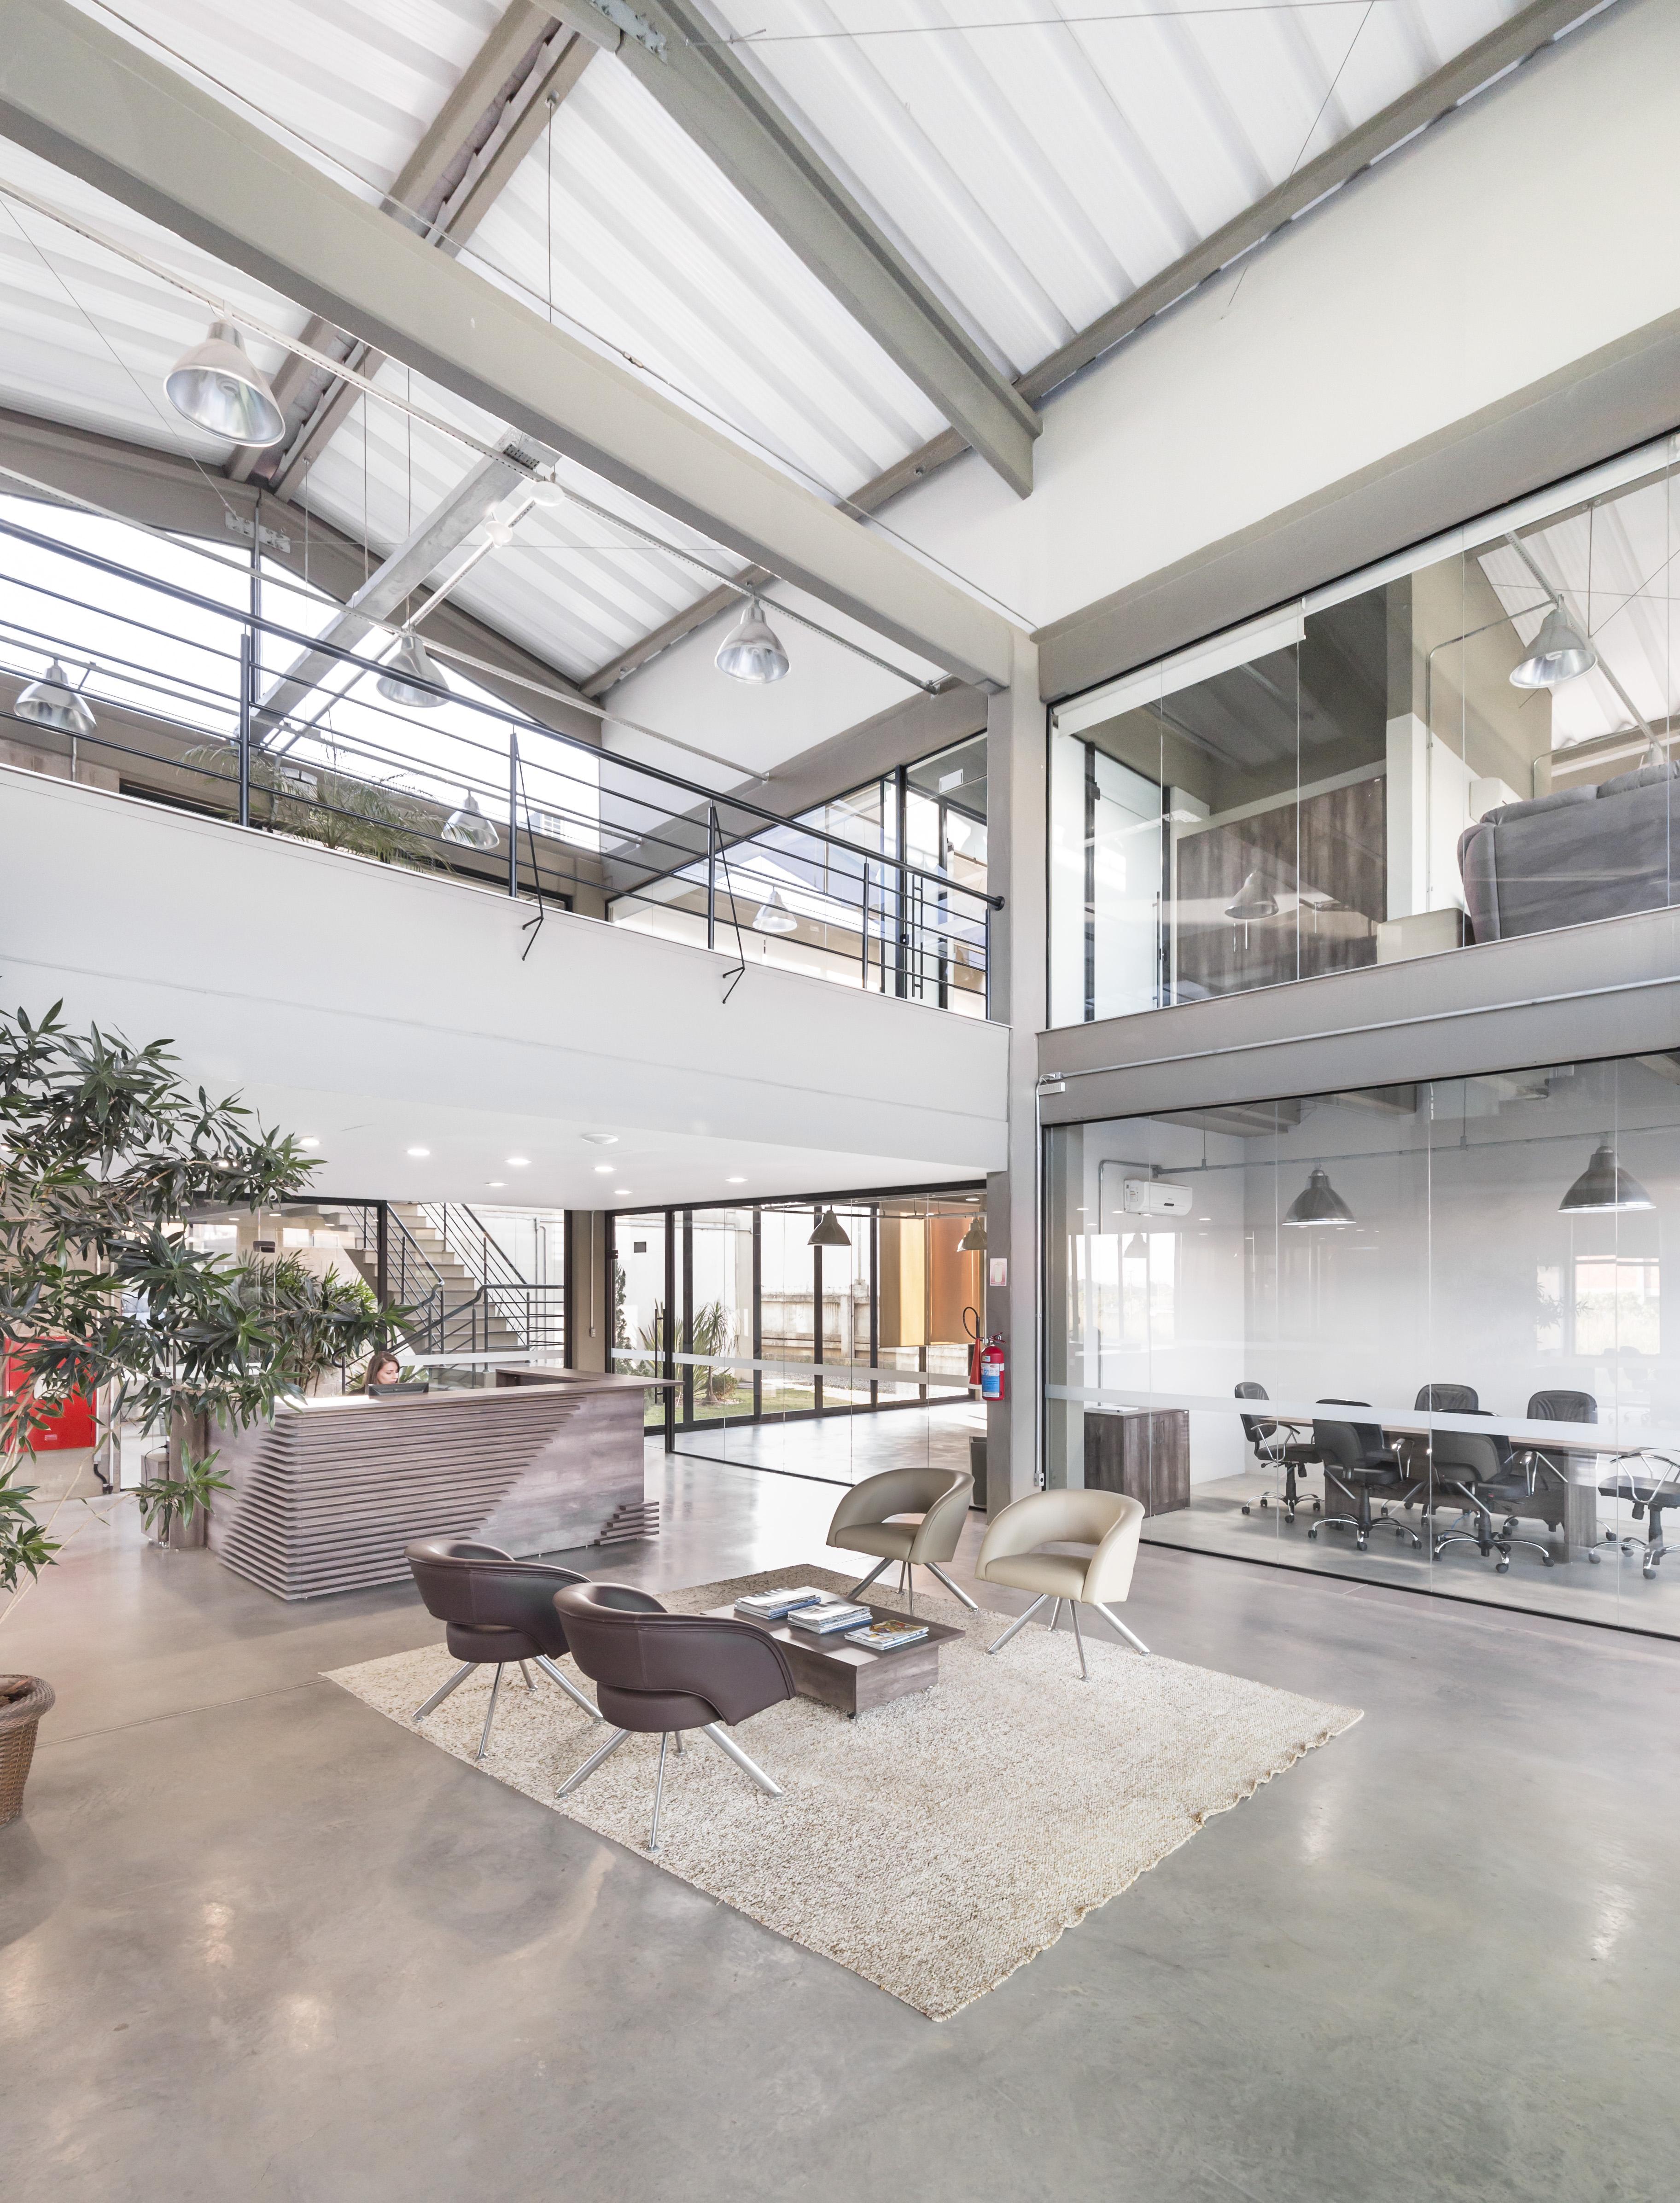 Engemold Headquarters - Hall